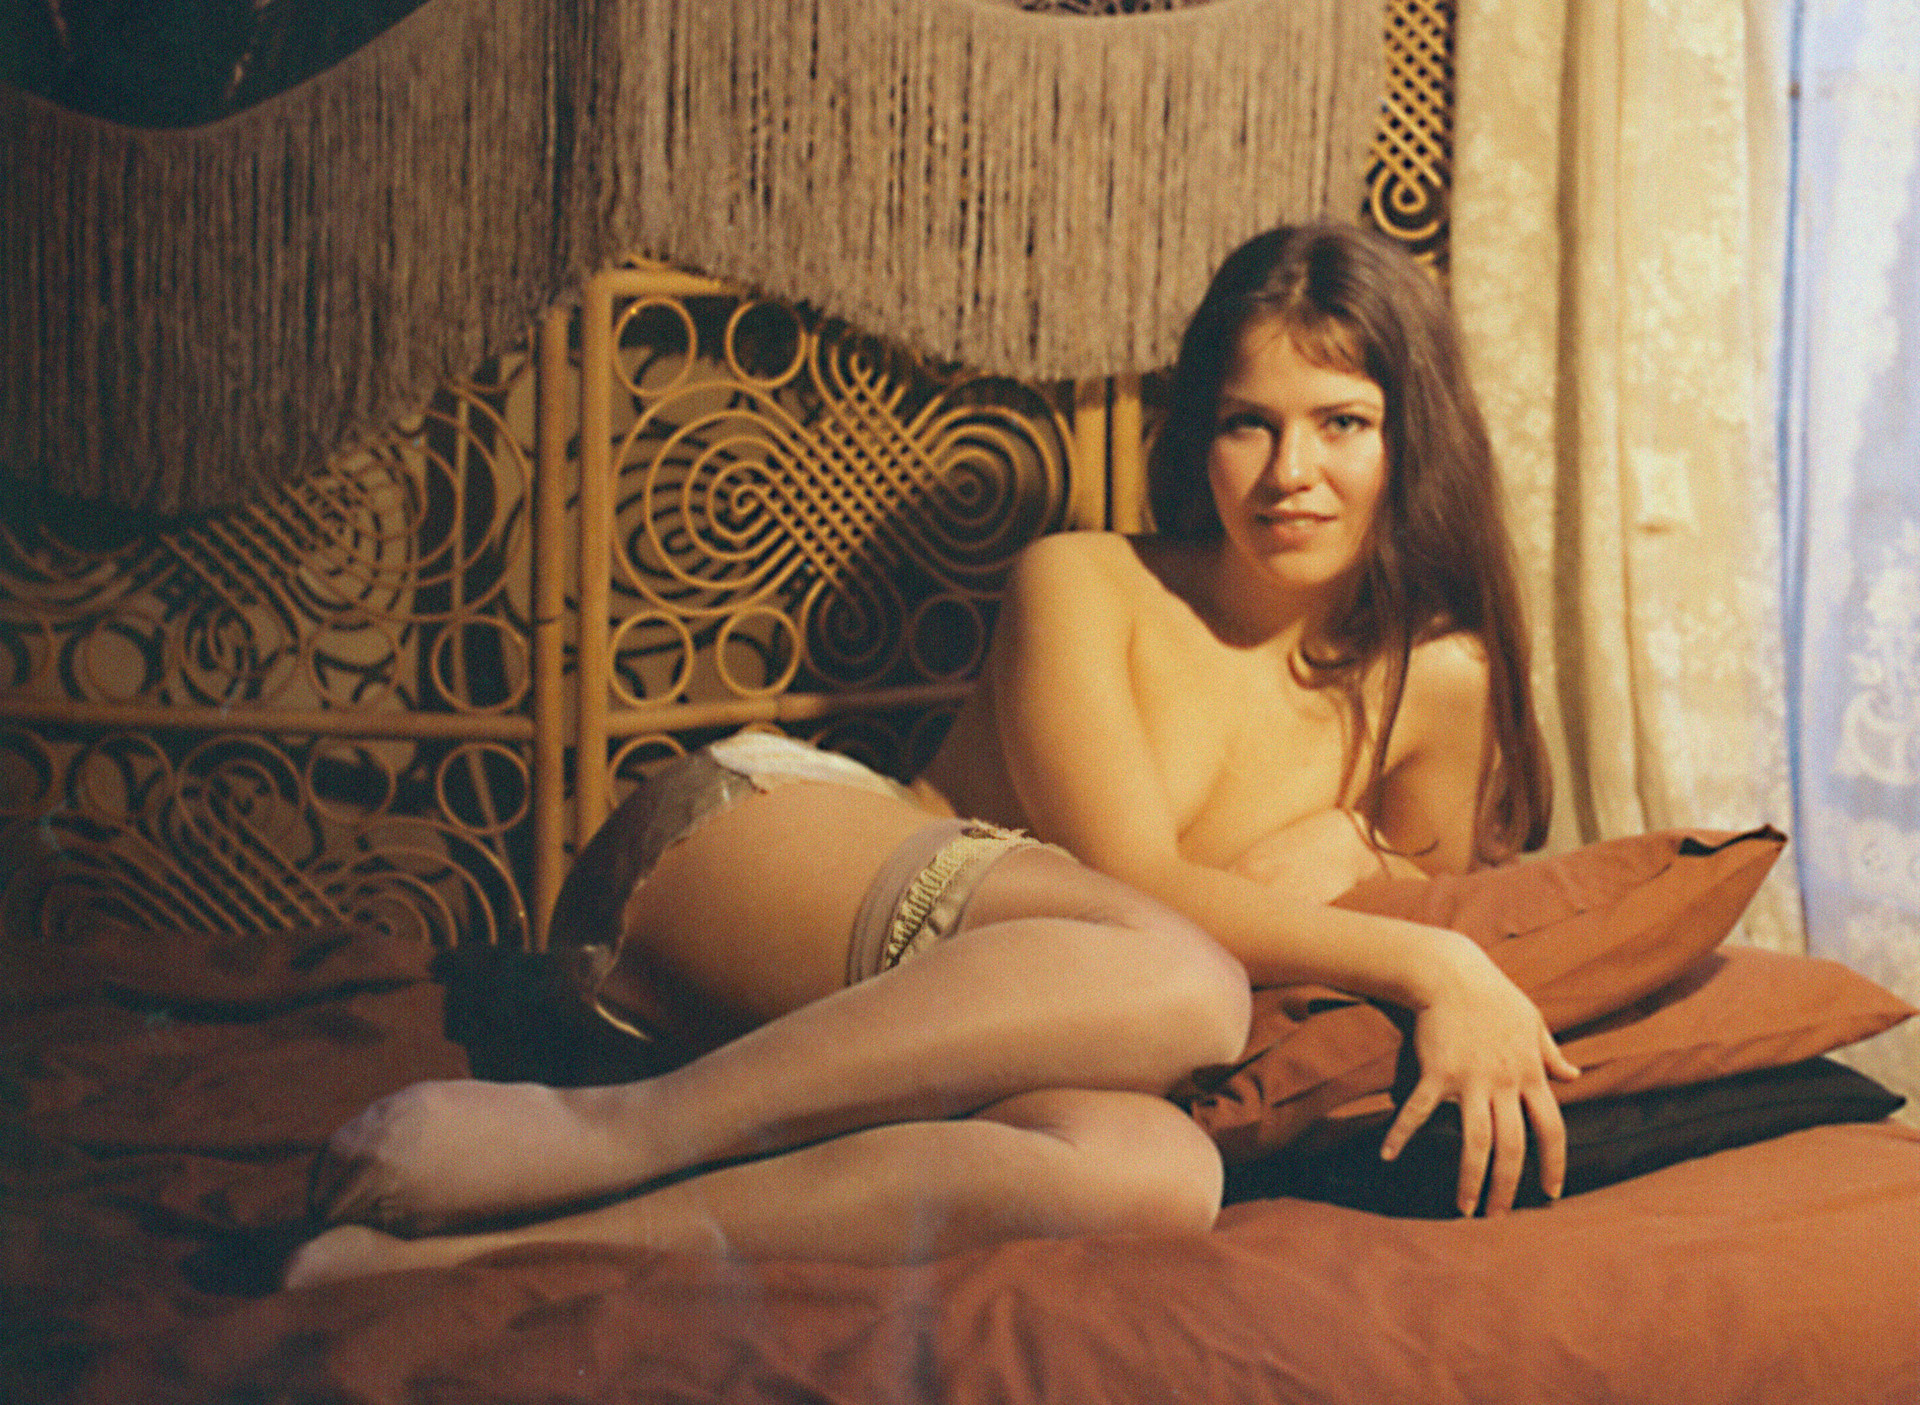 American actress Koo Stark's 'soft porn' scene that rocked Buckingham Palace